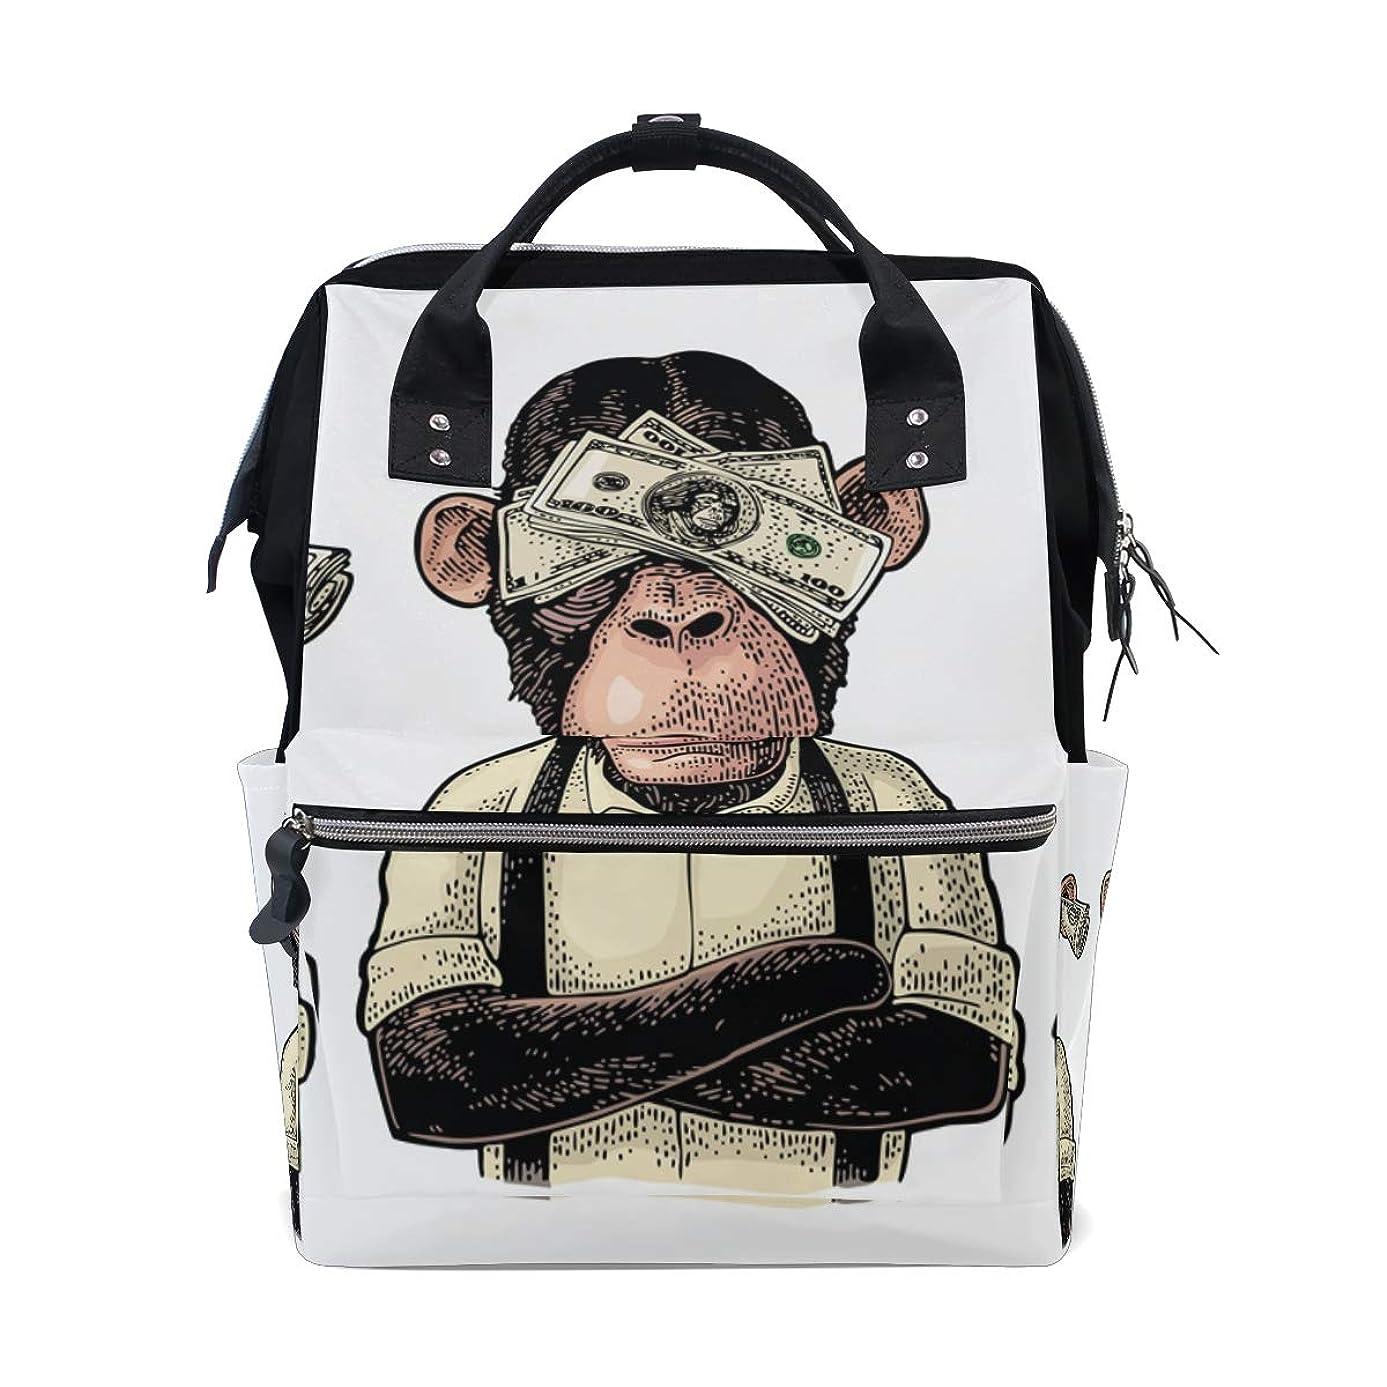 Funny Monkey School Backpack Large Capacity Mummy Bags Laptop Handbag Casual Travel Rucksack Satchel For Women Men Adult Teen Children